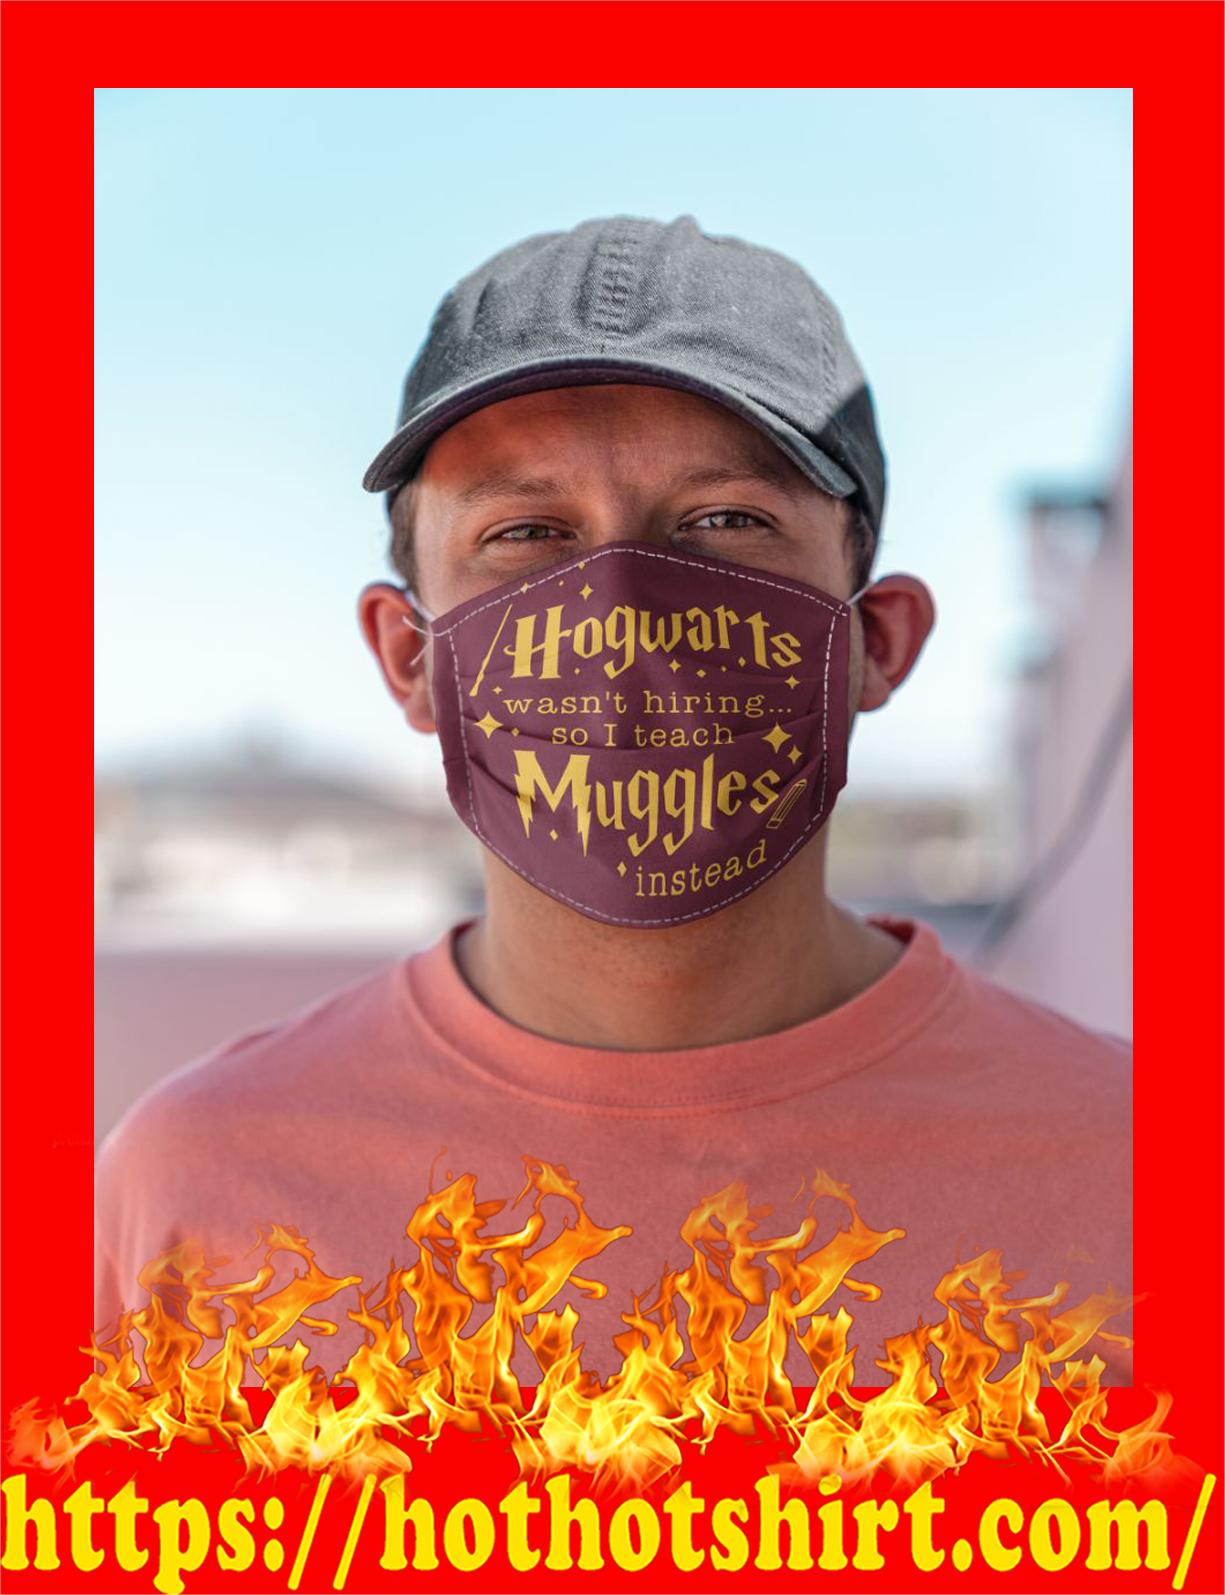 Hogwarts wasn't hiring so i teach muggles instead 3d face mask - detail